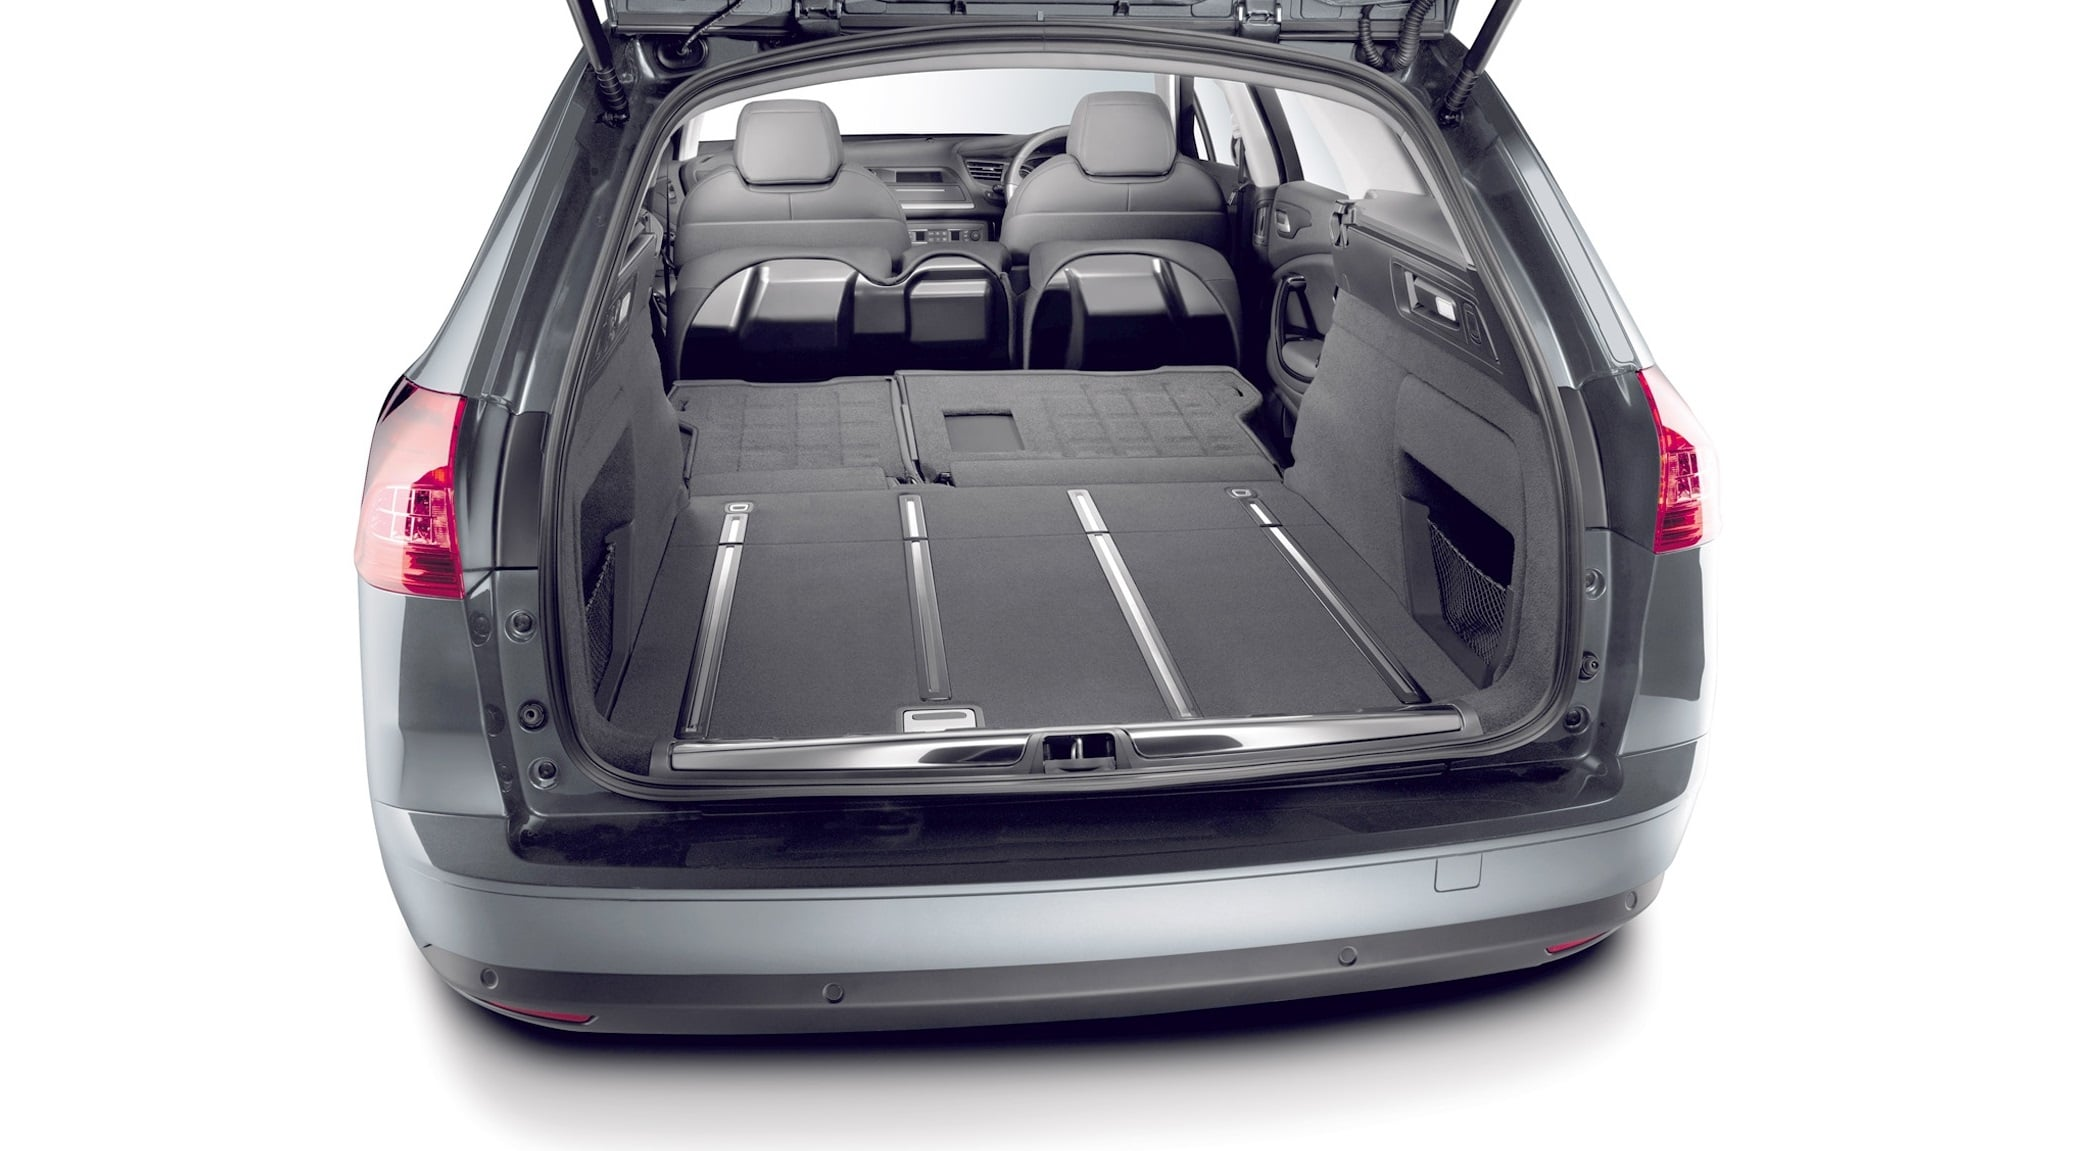 Citroën C5, Citroën, C5, Clive Sinclair, Fance, french, french car, family car, motoring, automotive, car, cars, autotrader, ebay motors, car sales, car for sale, vts